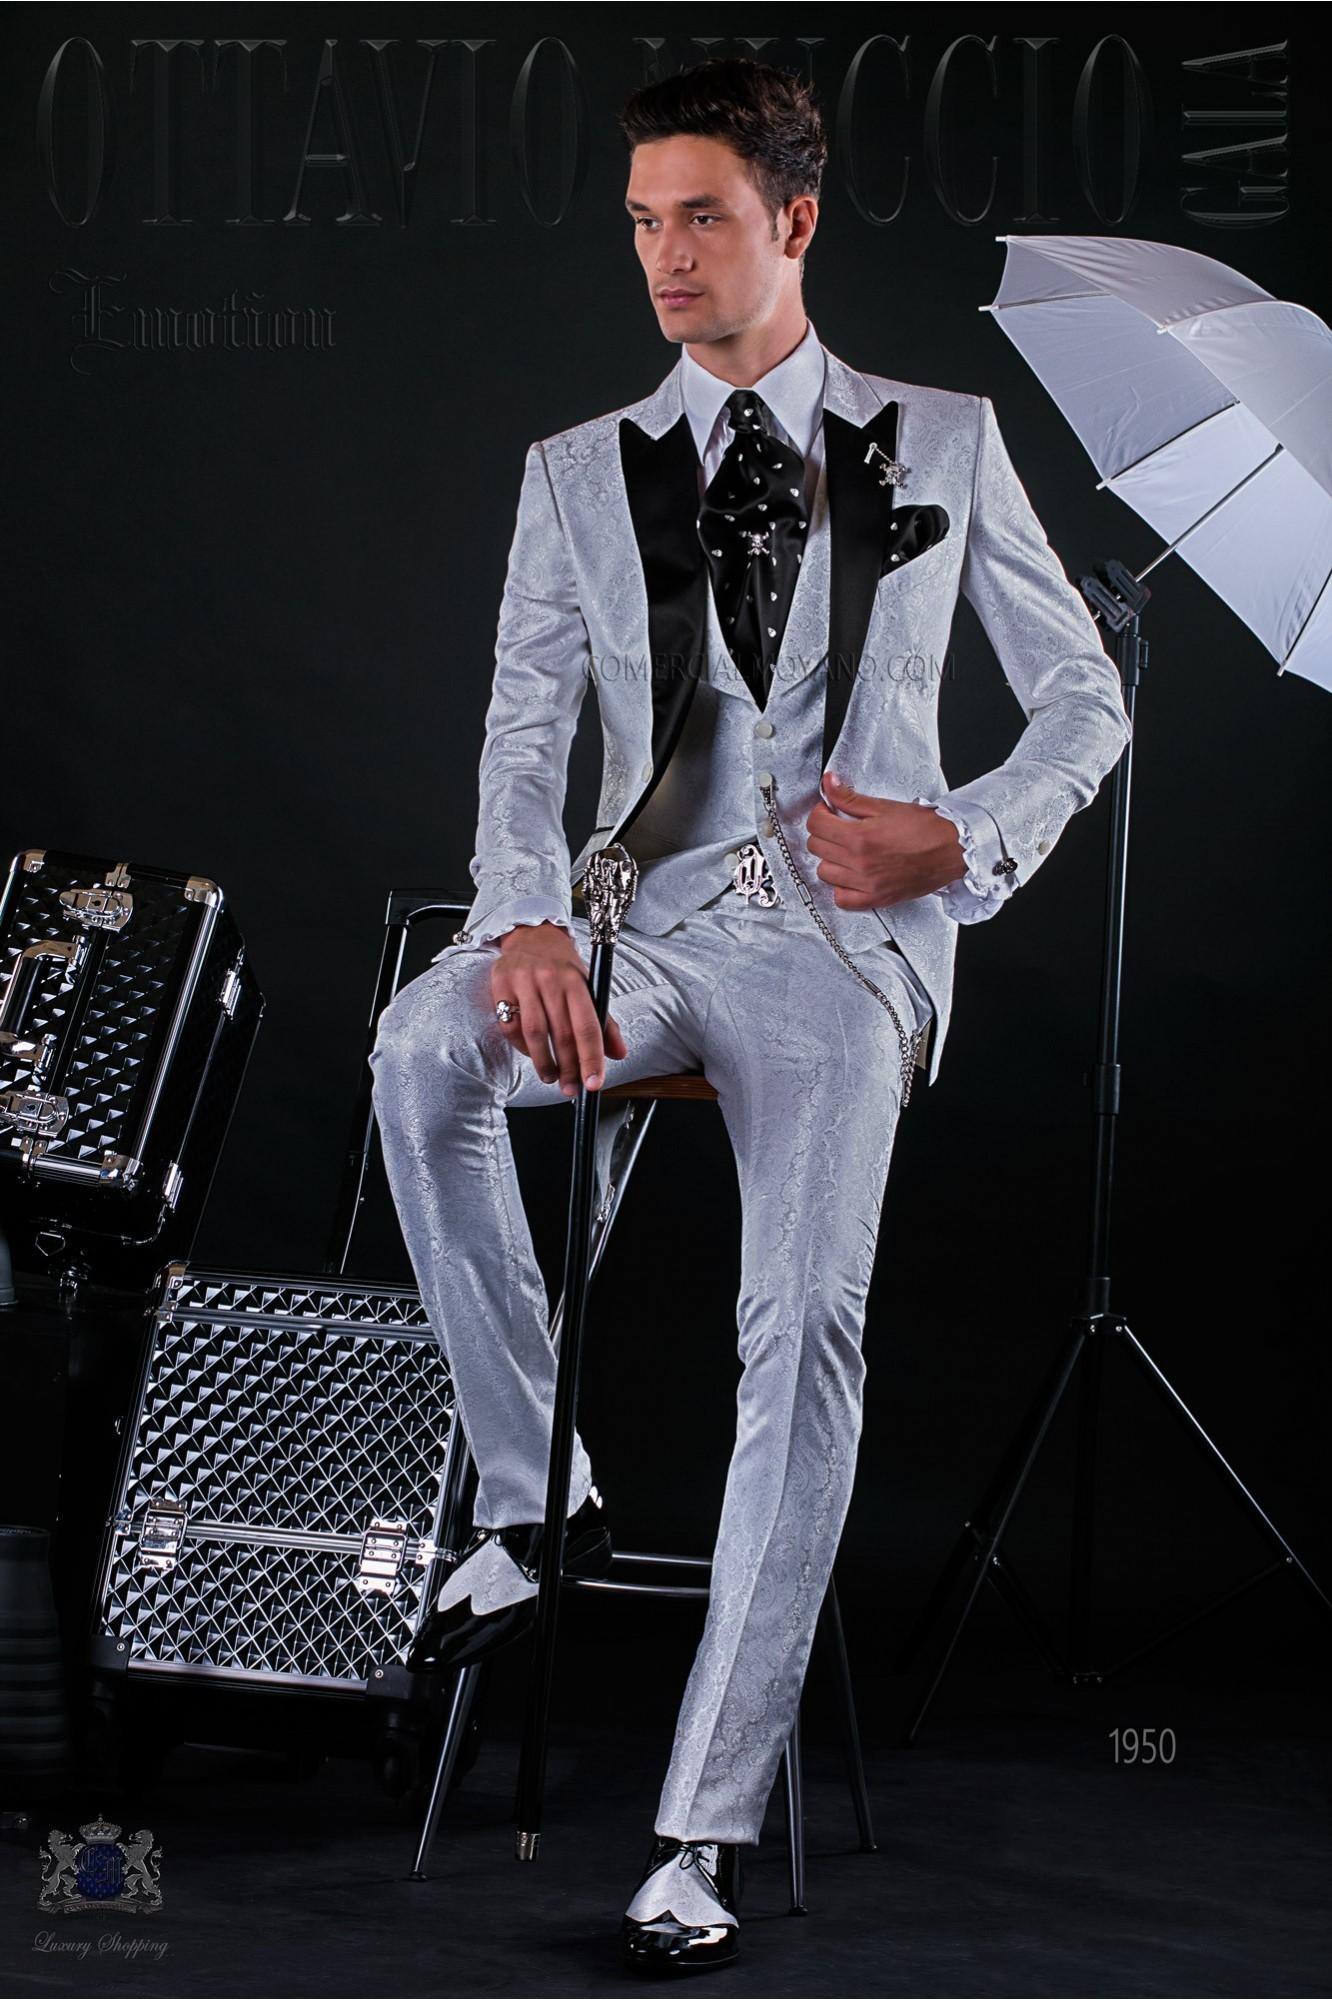 Italian fashion bespoke suit white jacquard with black satin peak lapels